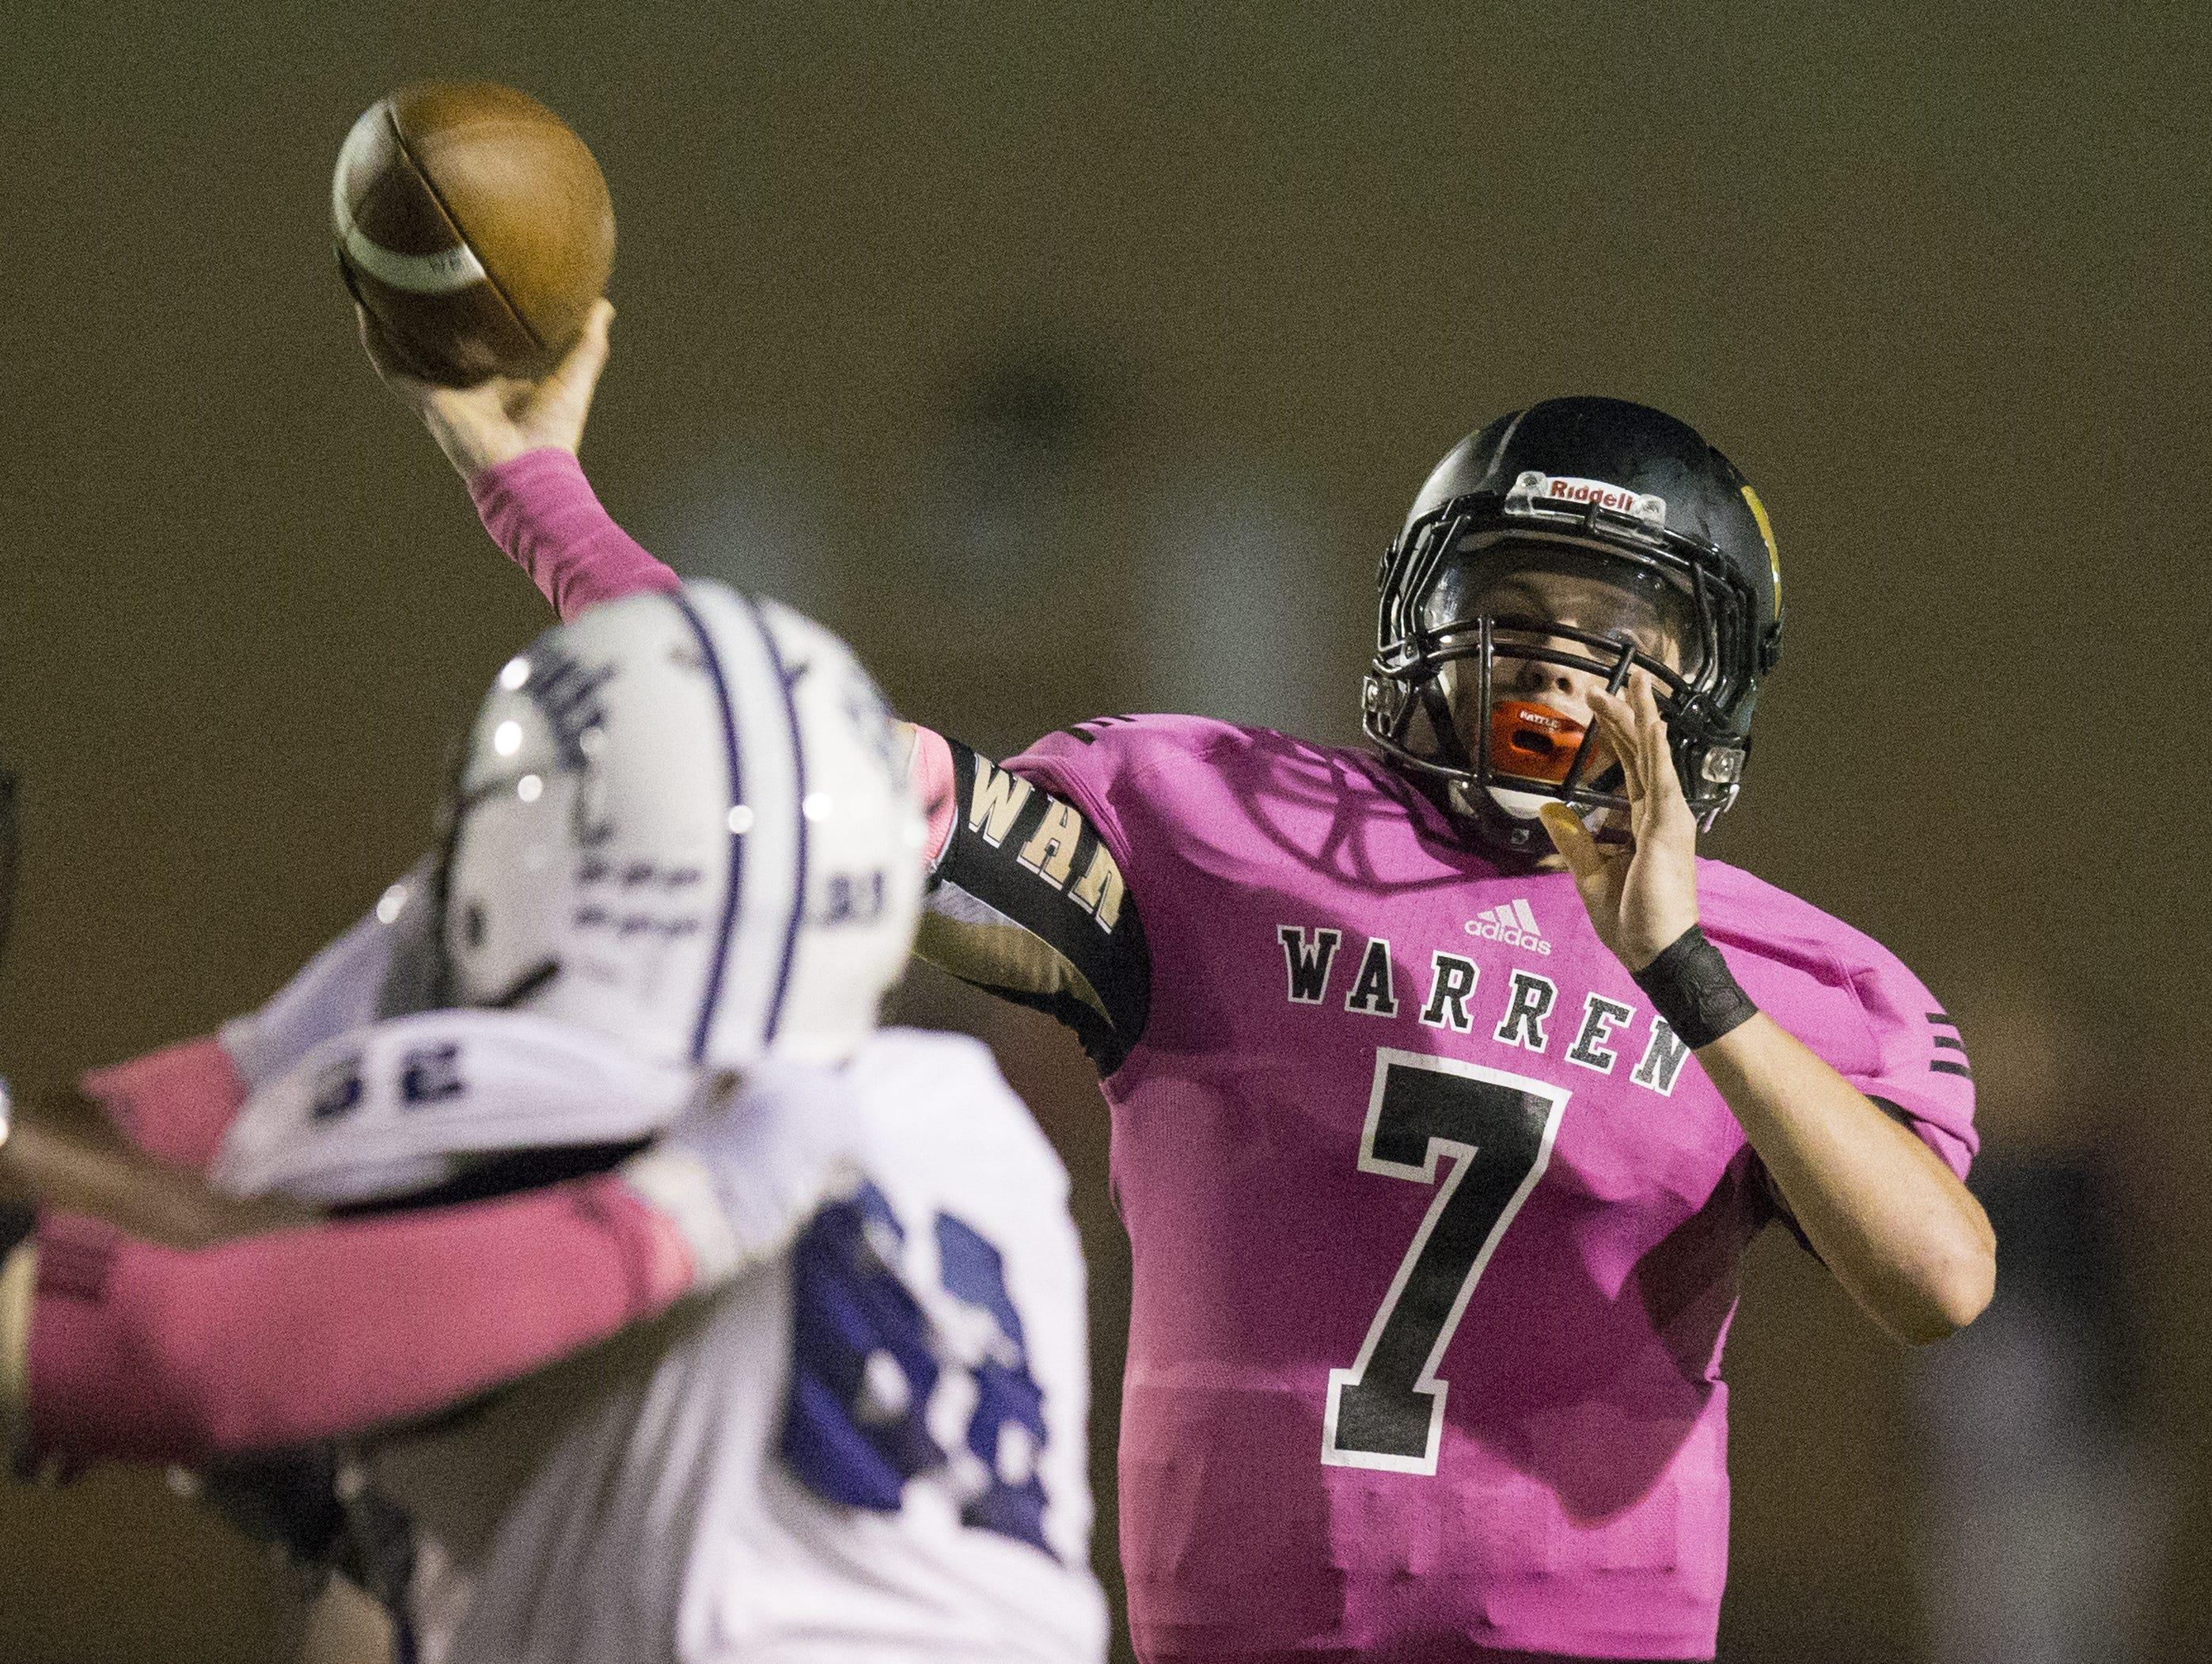 Zach Summeier, quarterback for Warren Central, throws, Ben Davis at Warren Central High School football, Indianapolis, Friday, Sept. 16, 2016. WCHS won 35-34.